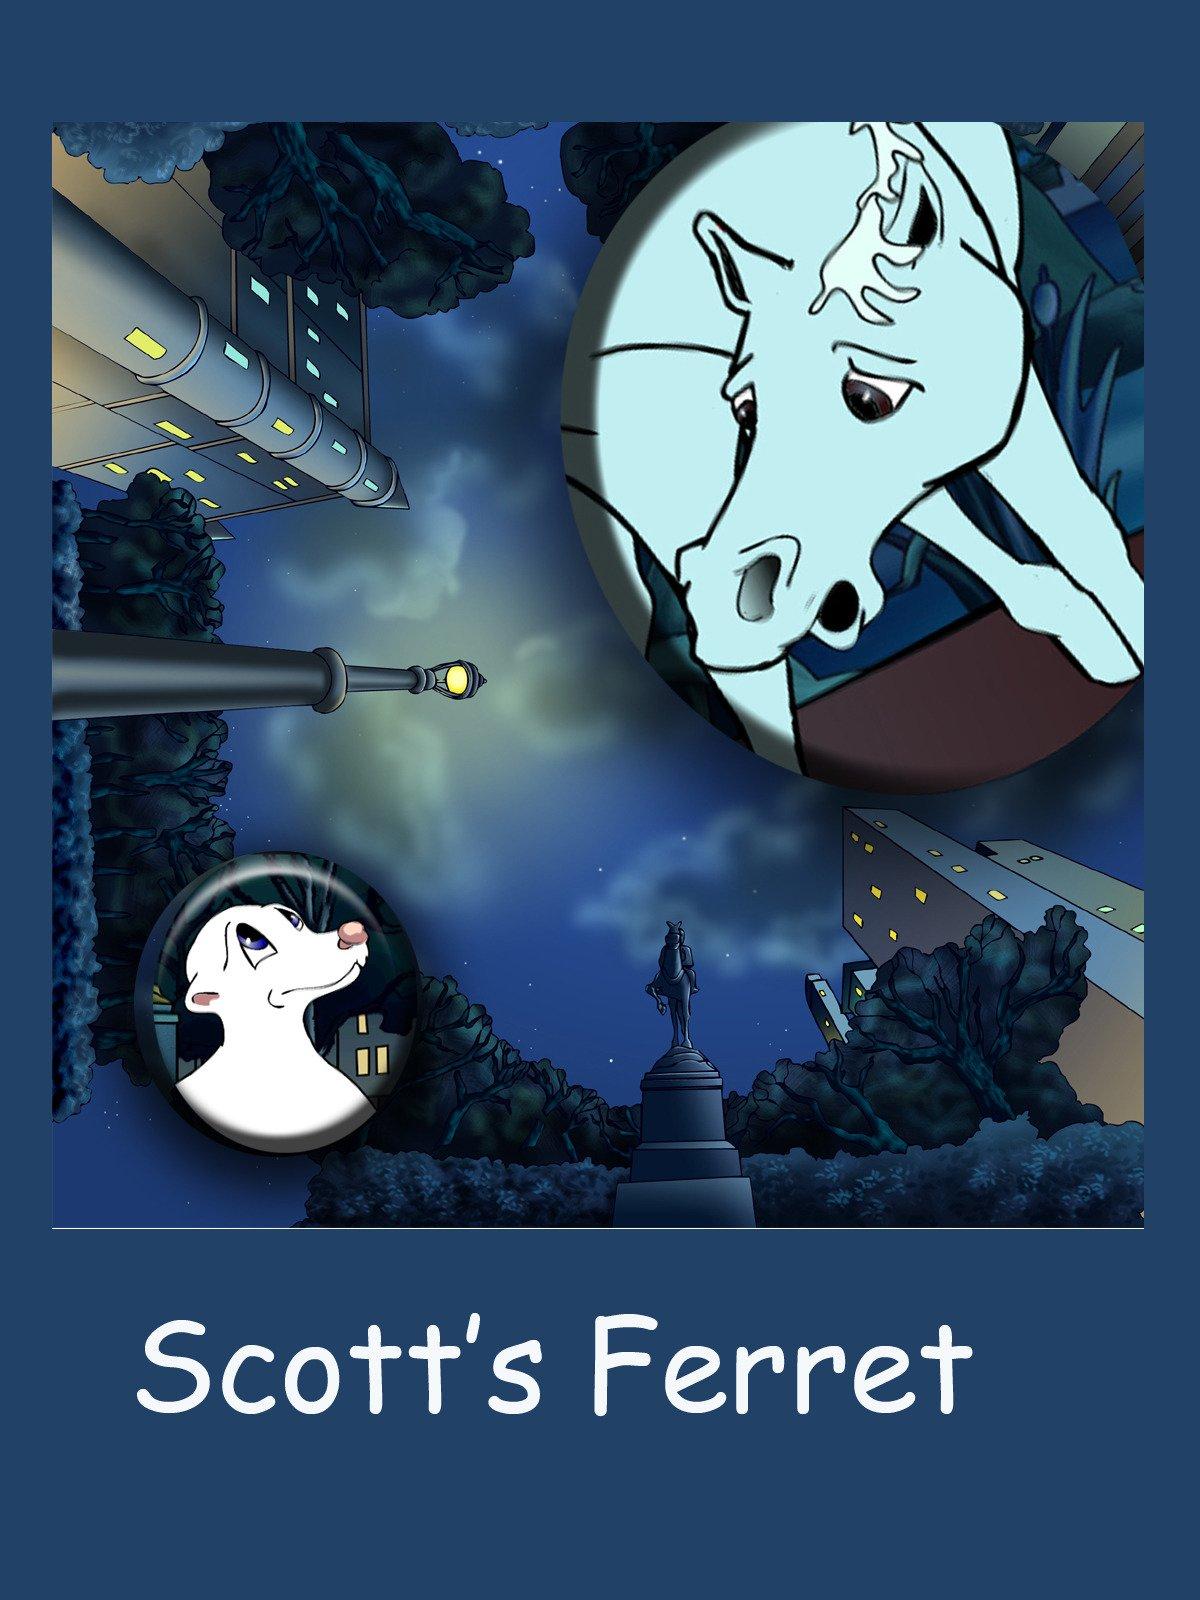 Scott's Ferret